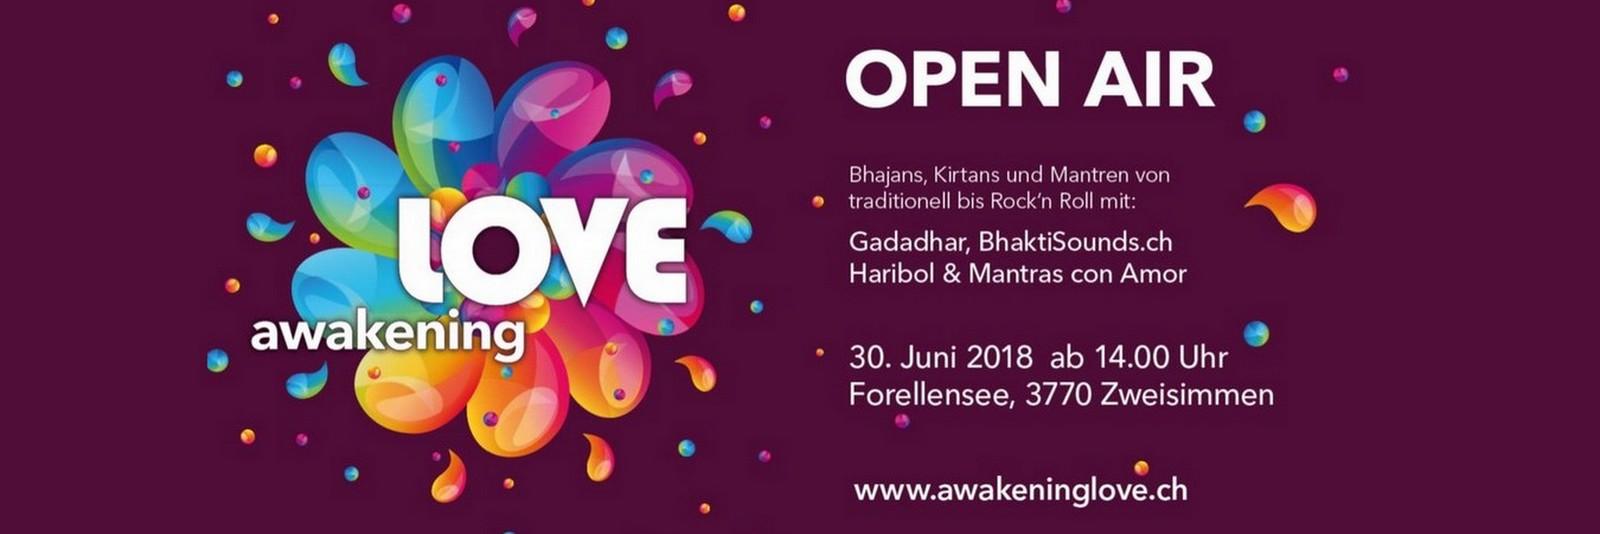 Awakening Love Open Air